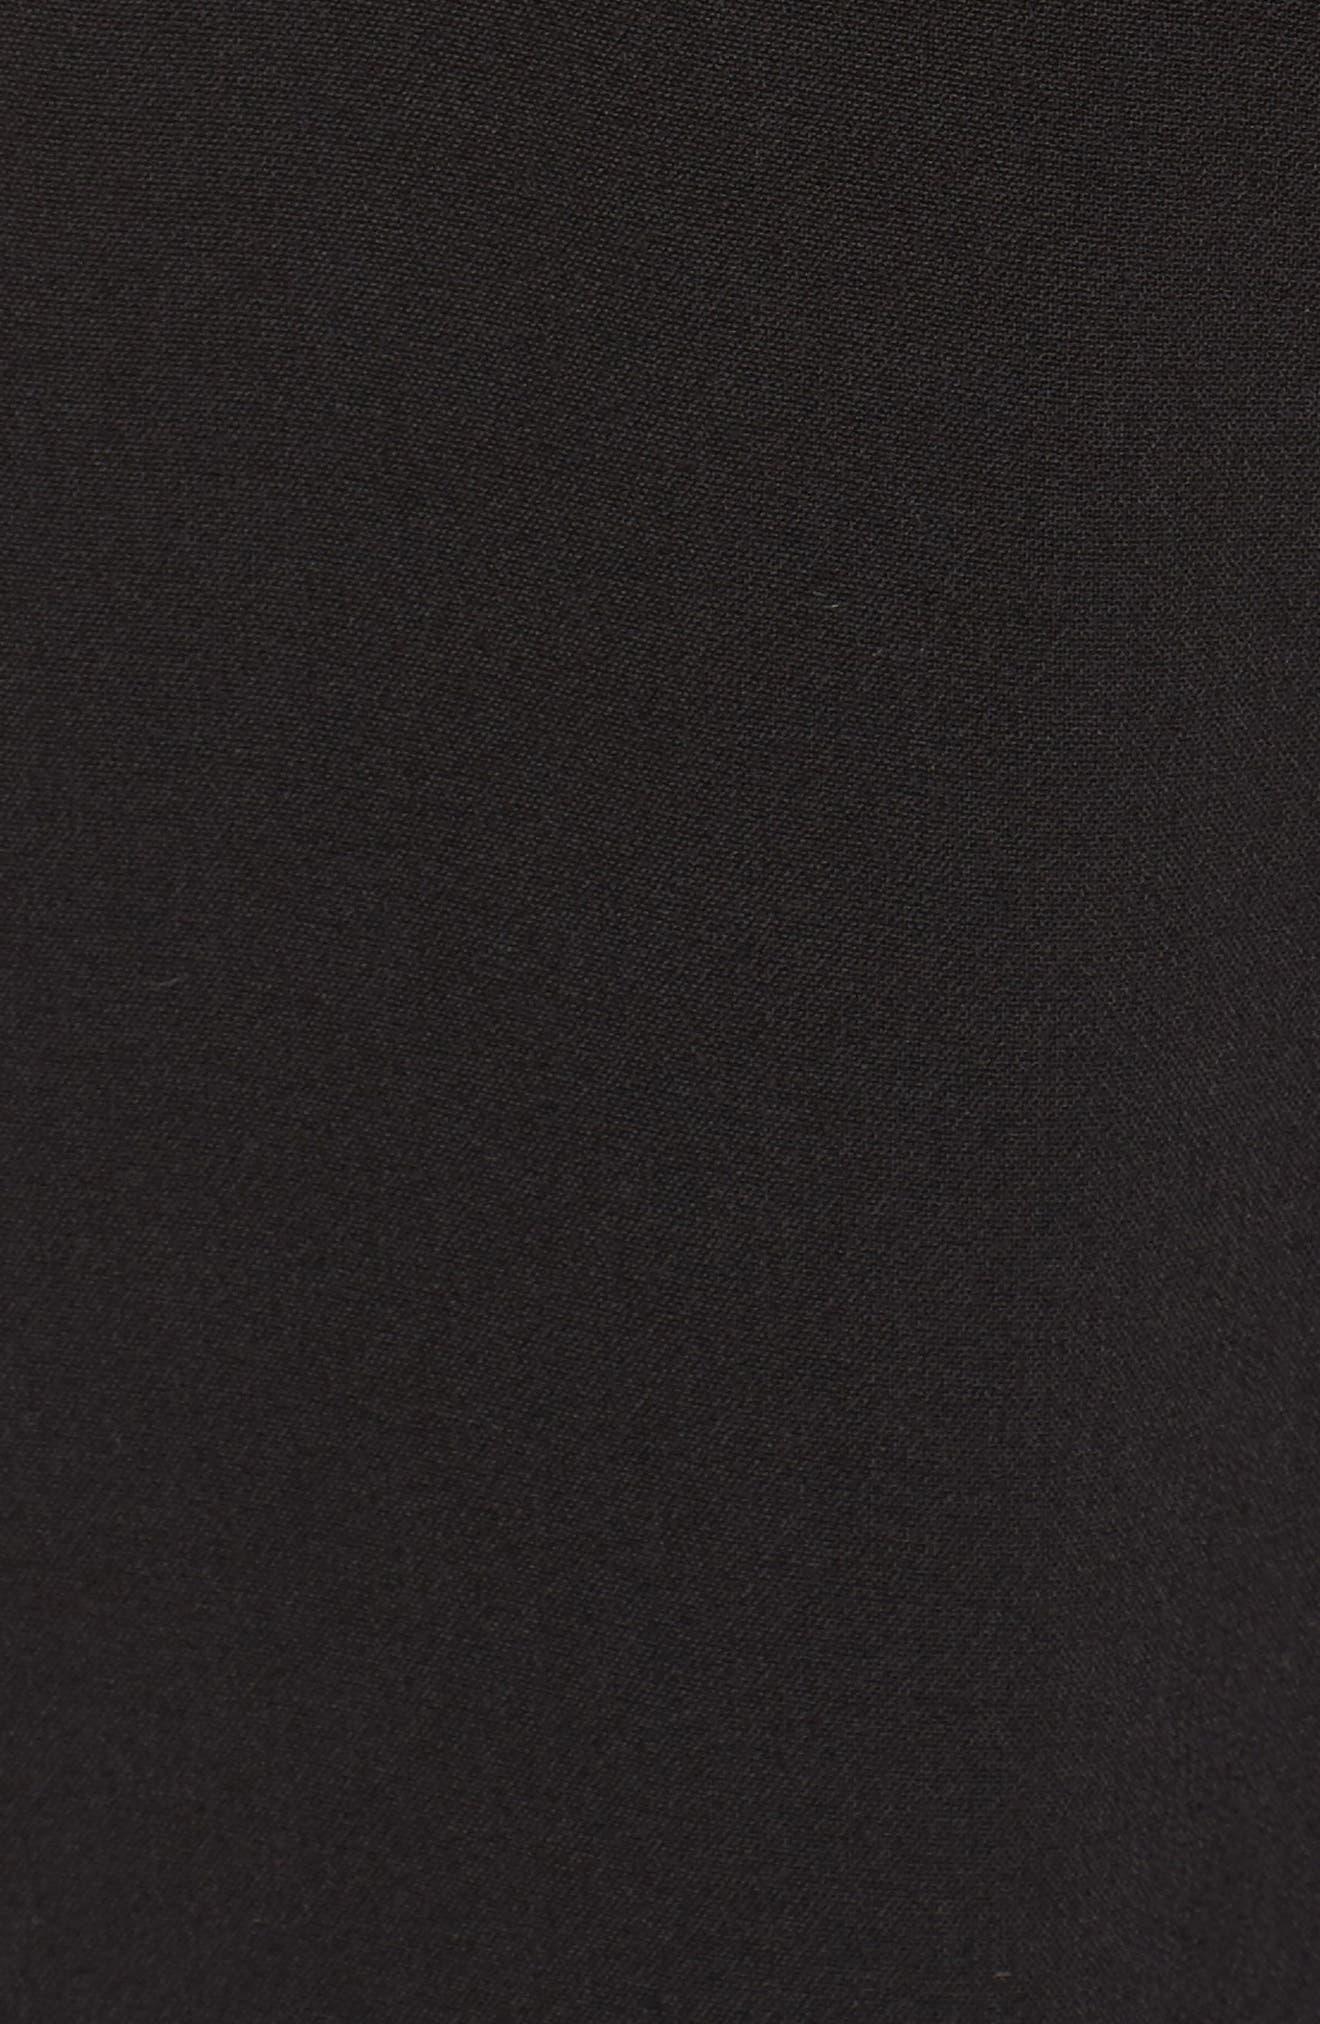 Ruffle Off the Shoulder Jumpsuit,                             Alternate thumbnail 5, color,                             Black